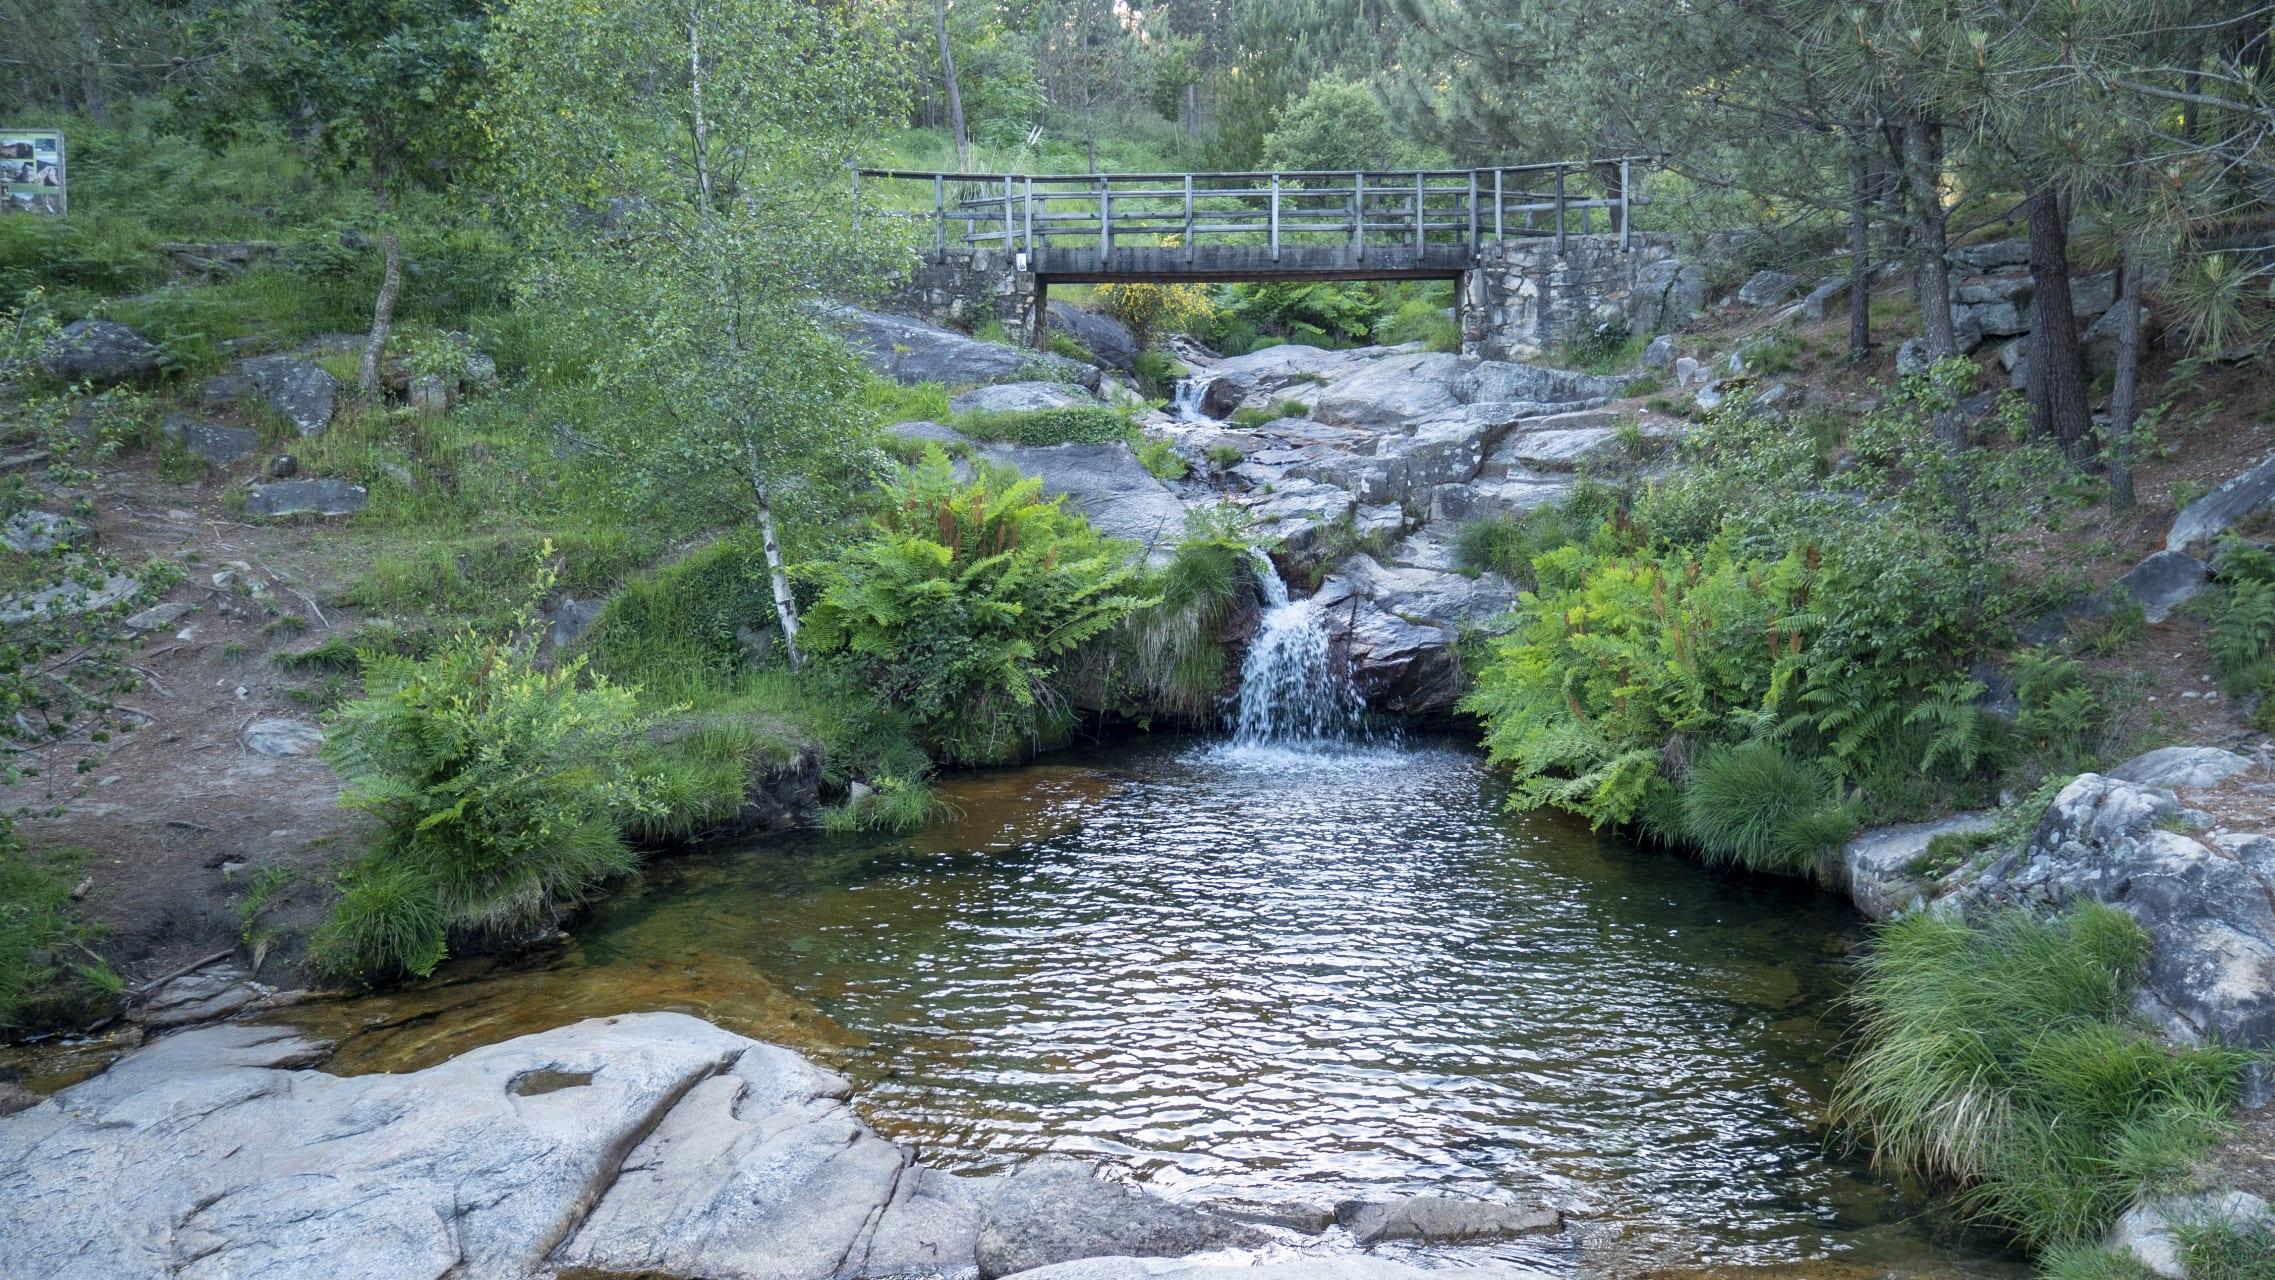 Galicia - Legend of Poza da Moura Waterfall Pool in the hills of Domaio